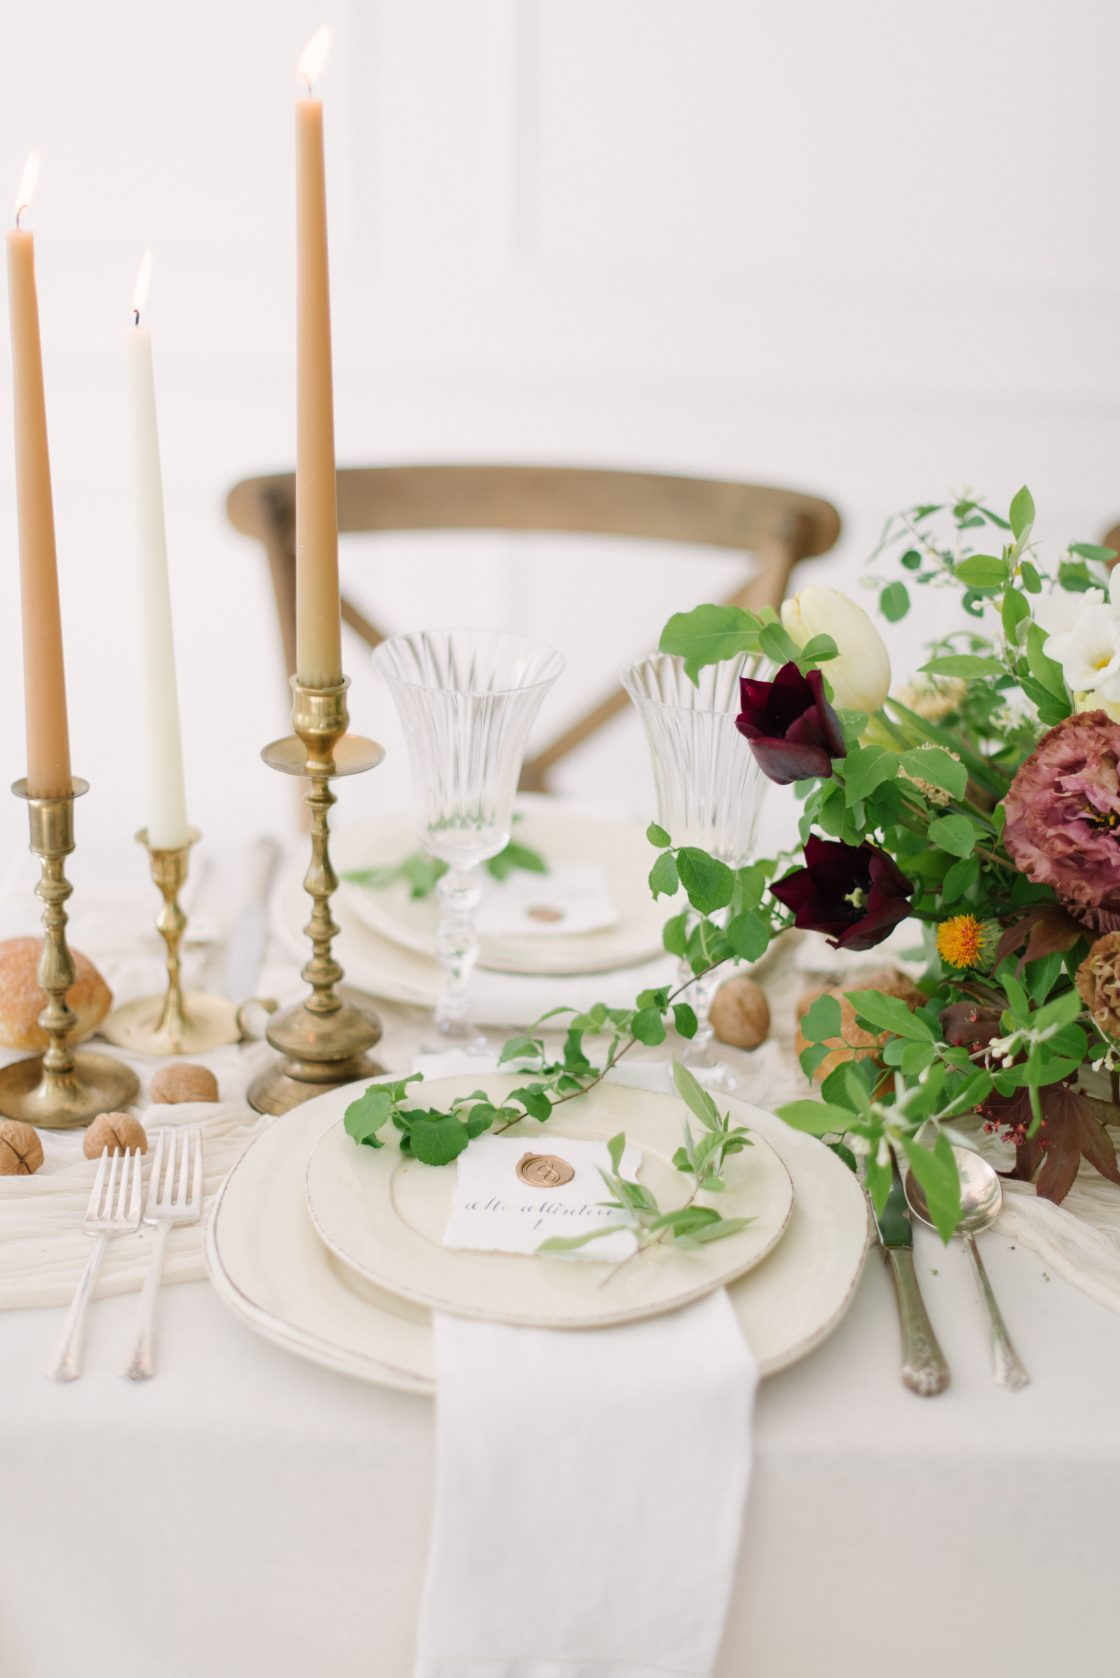 Elegant Romantic Wedding Place Setting